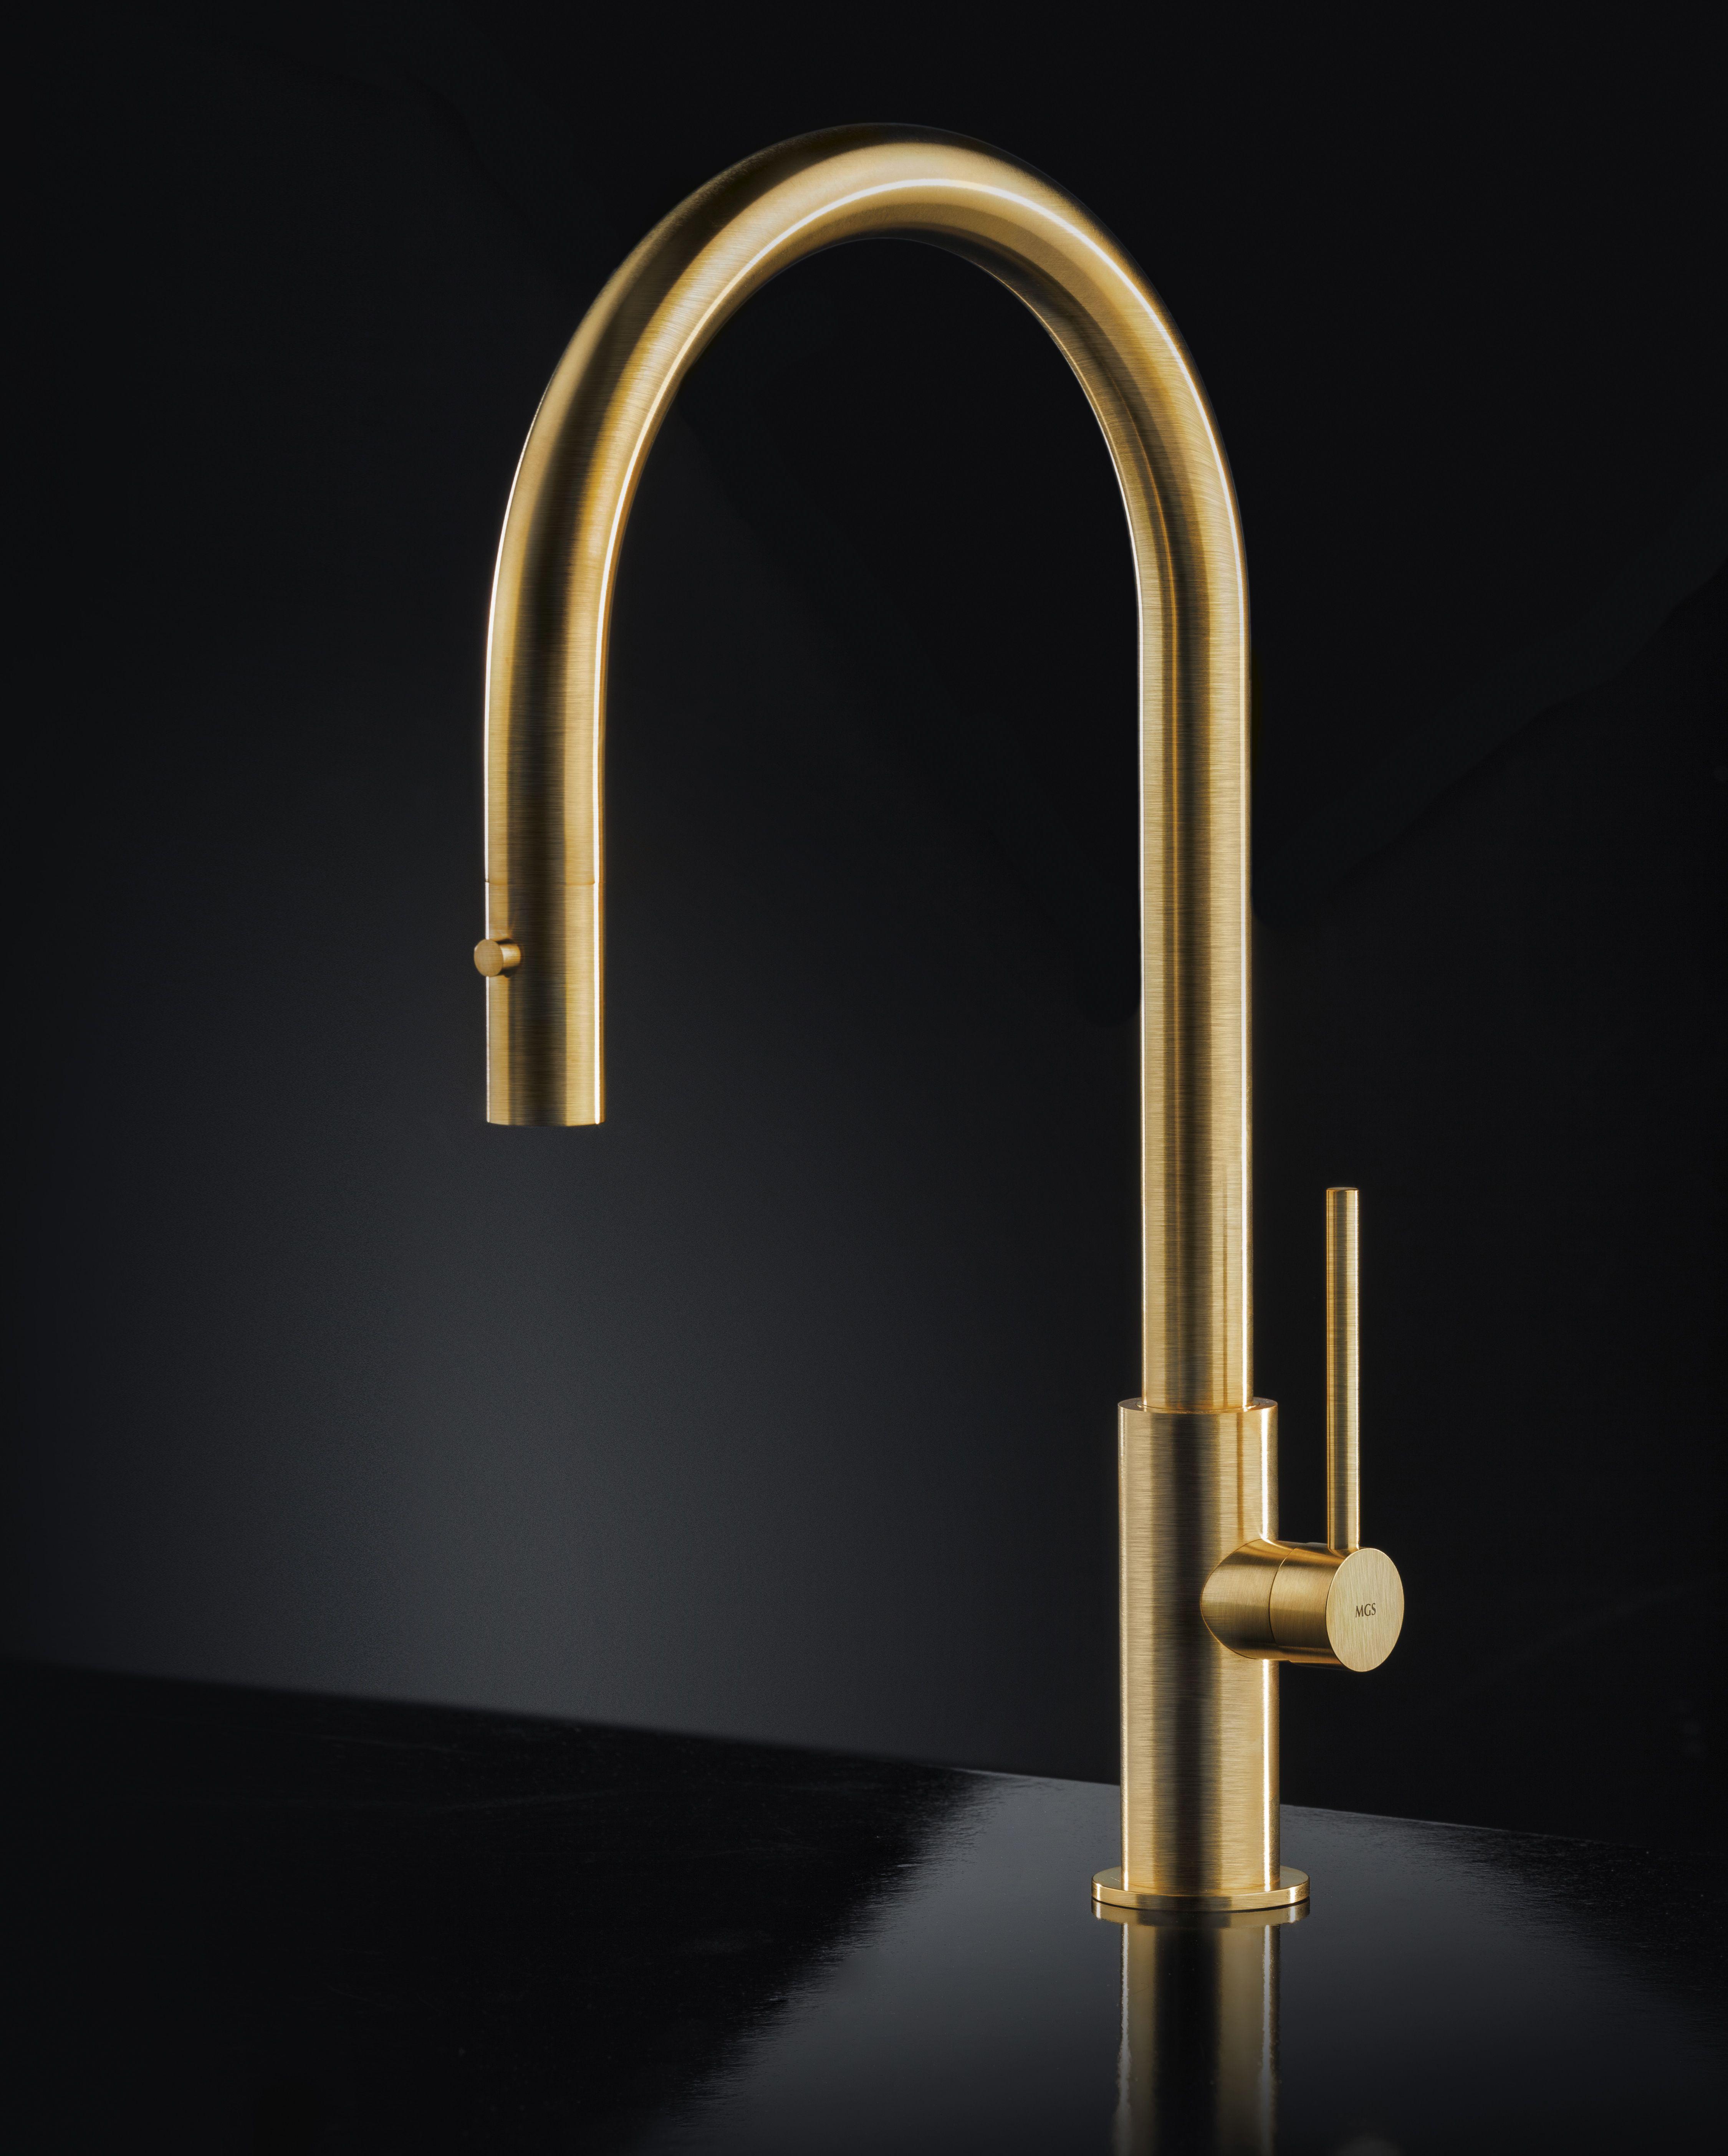 kit01 cea design finiture varie kitchen faucet home pinterest mgs keukenkraan spin d gold spinfaucetarchitectsnantes